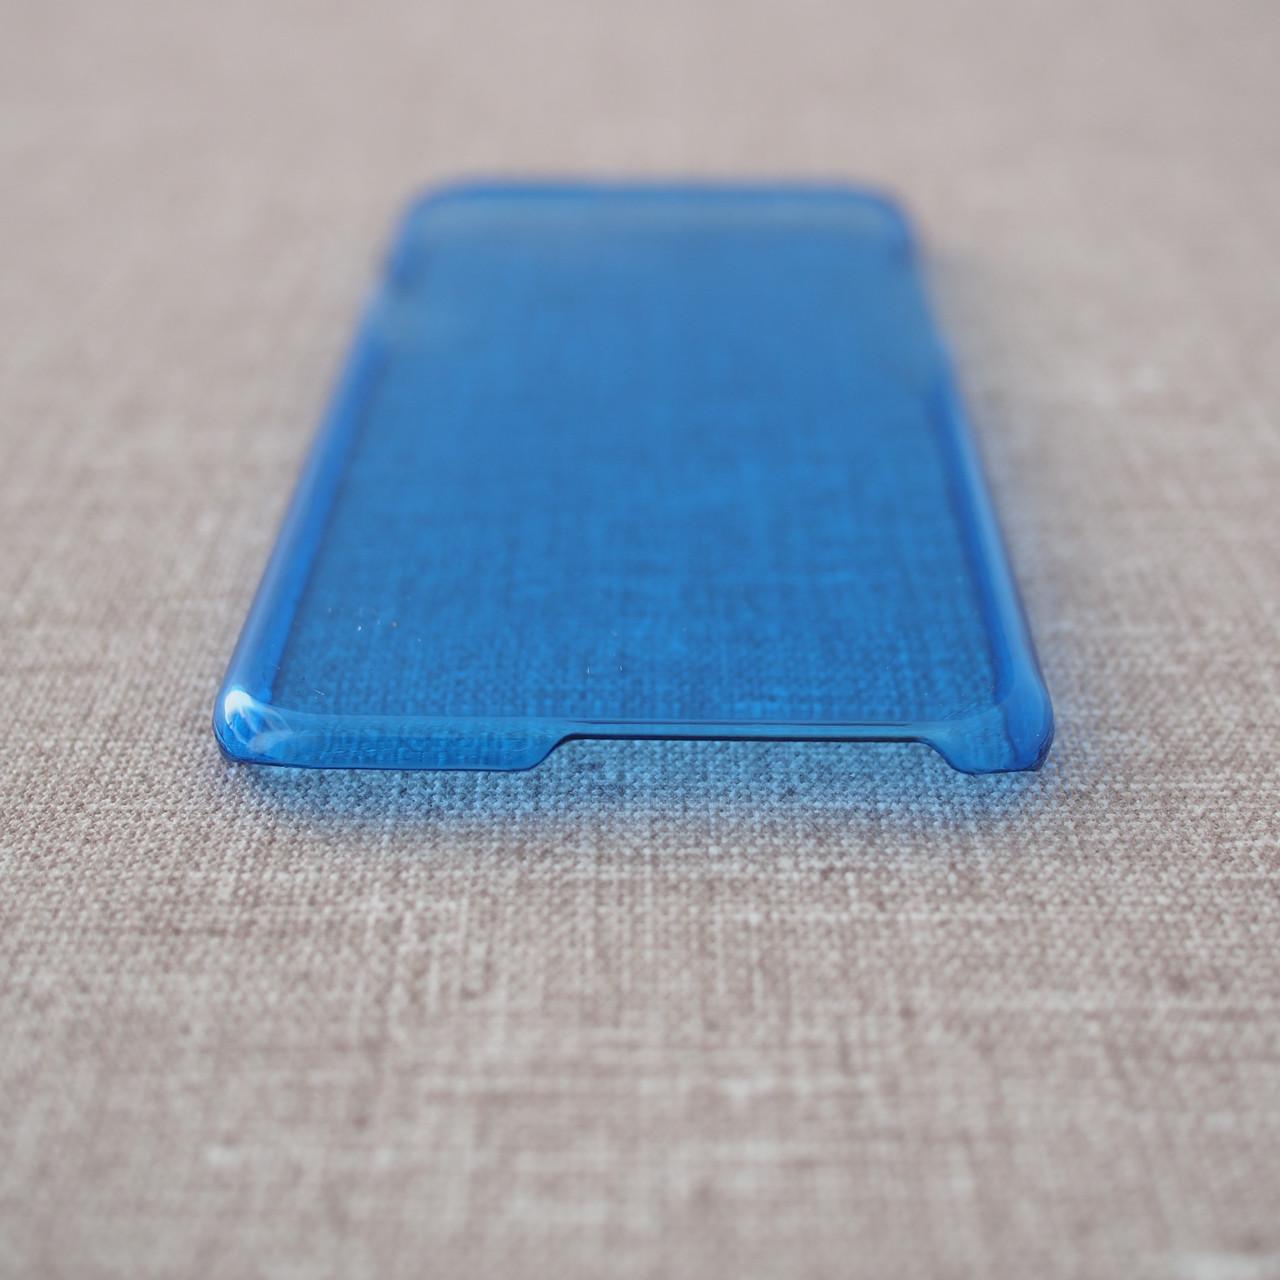 iPhone 6 blue Для телефона Синий